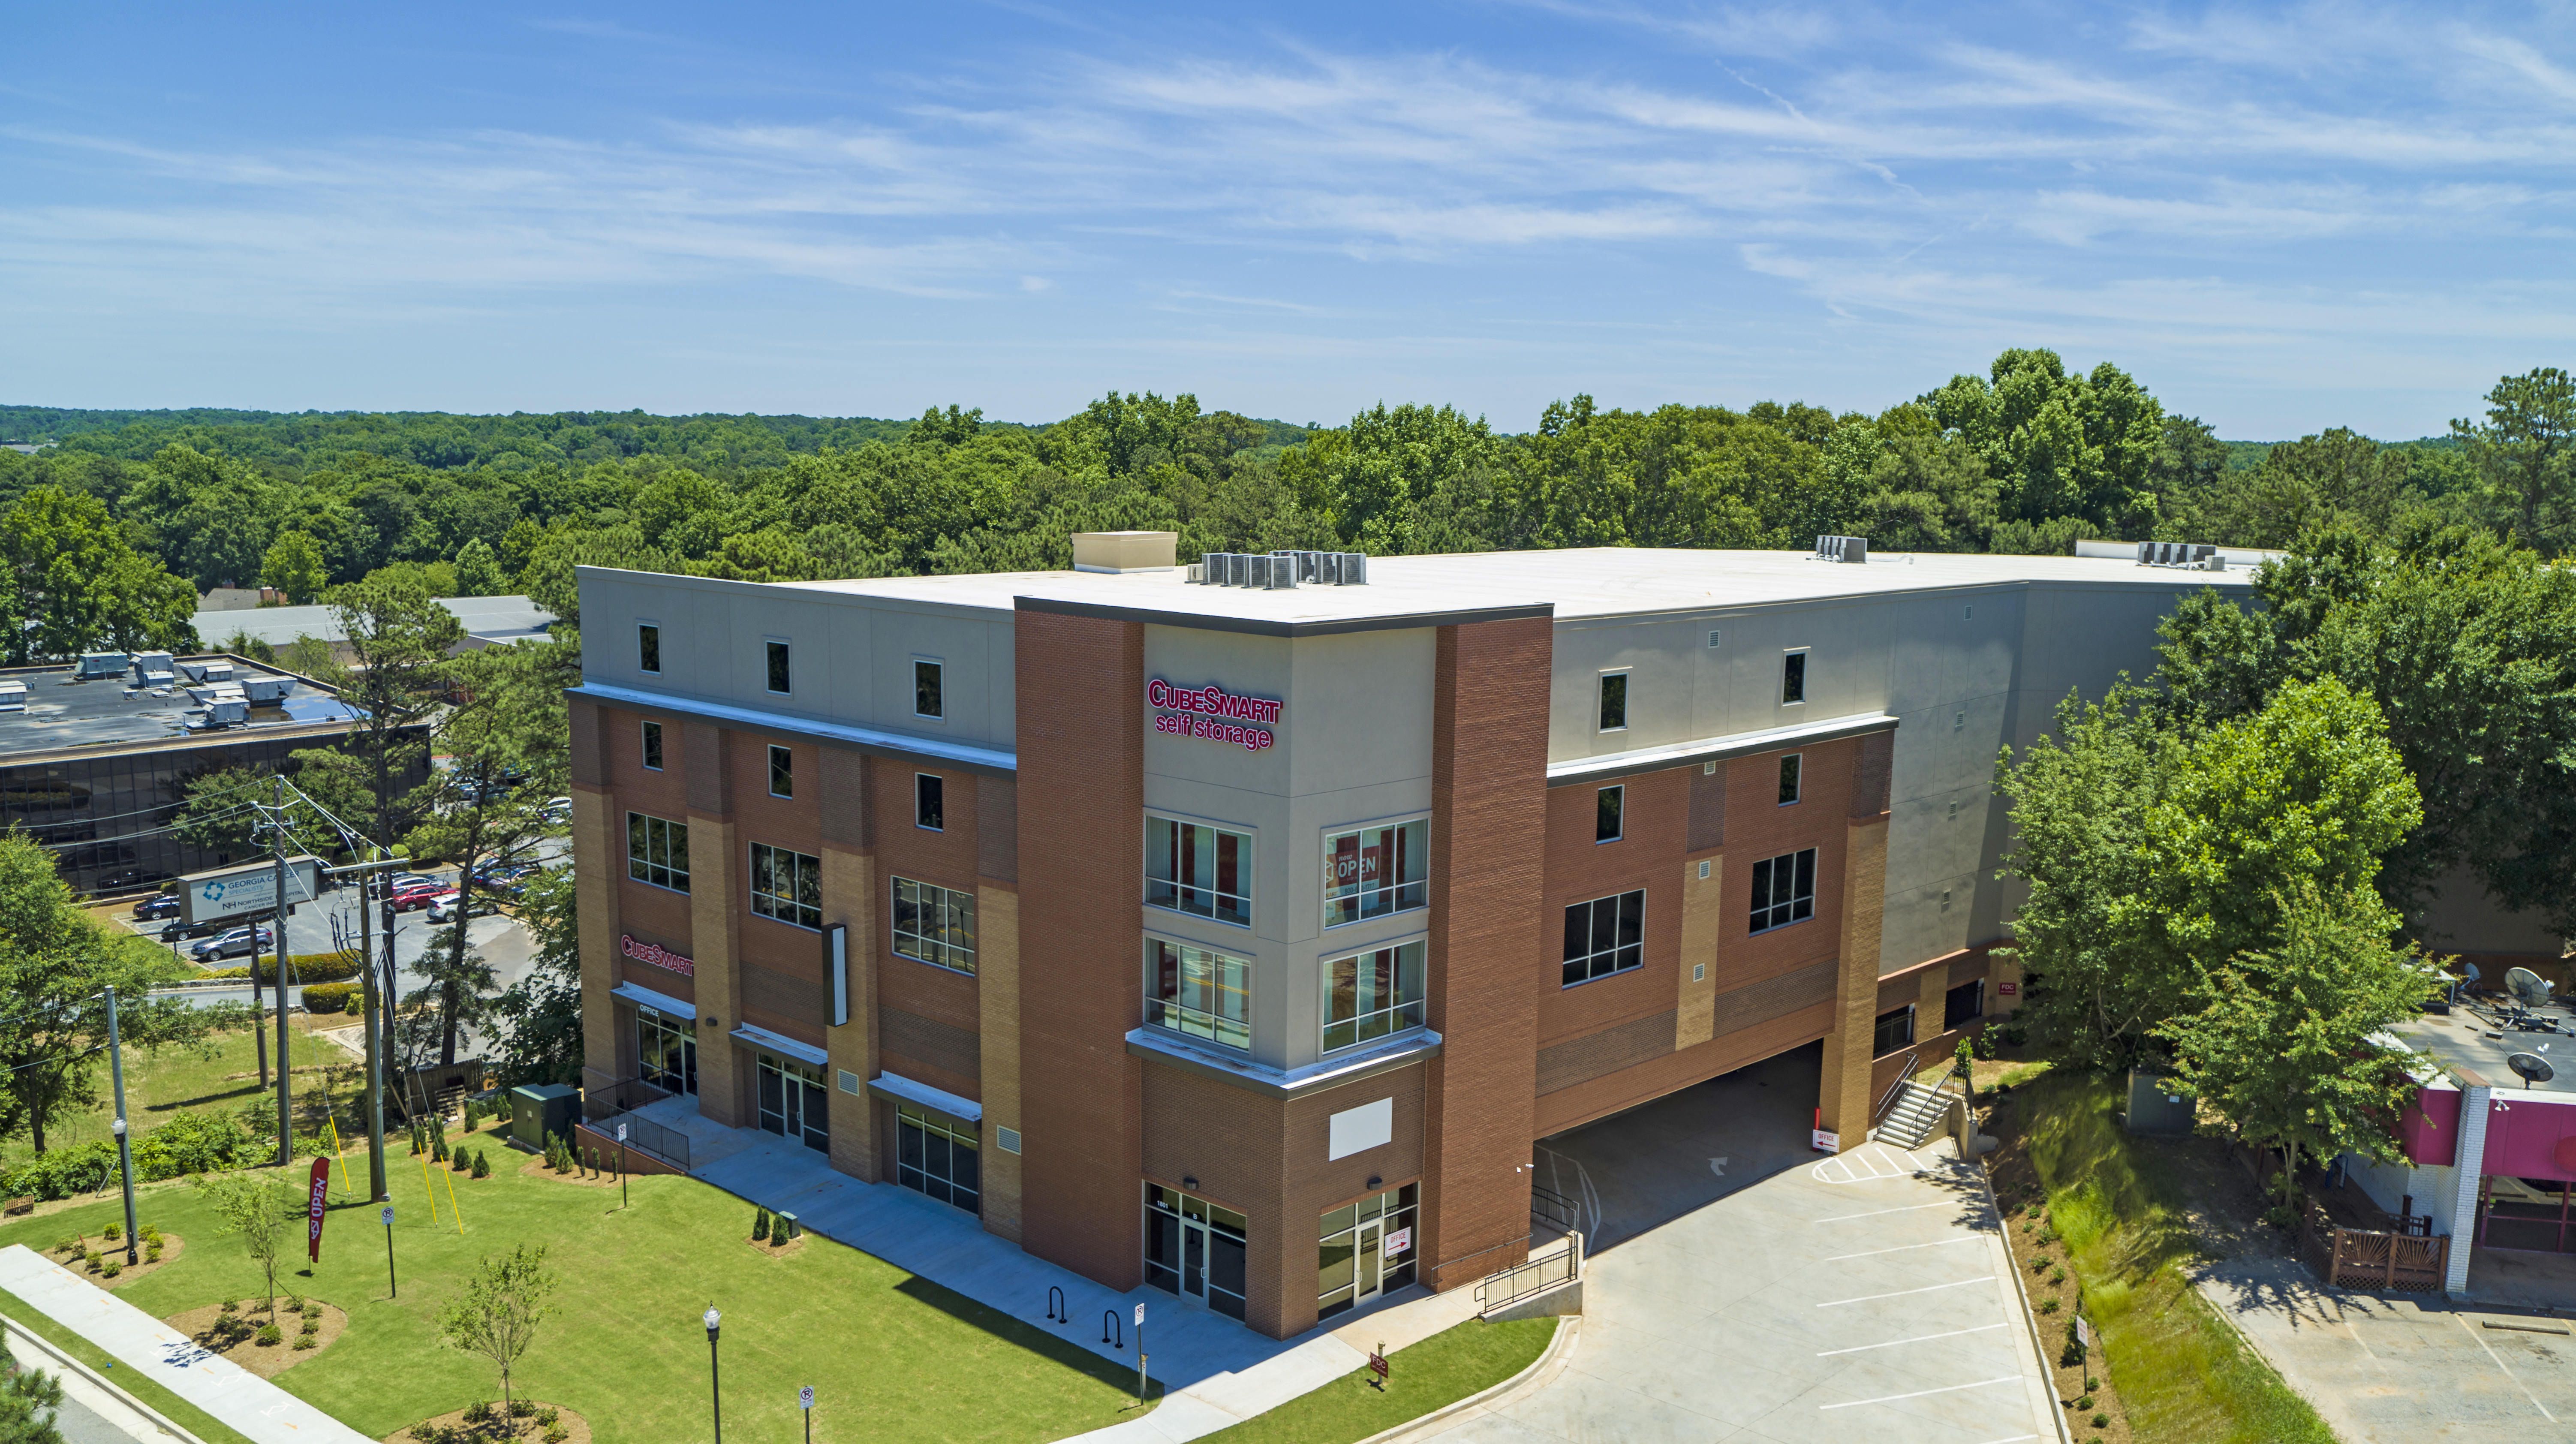 CubeSmart Storage - Dunwoody, GA